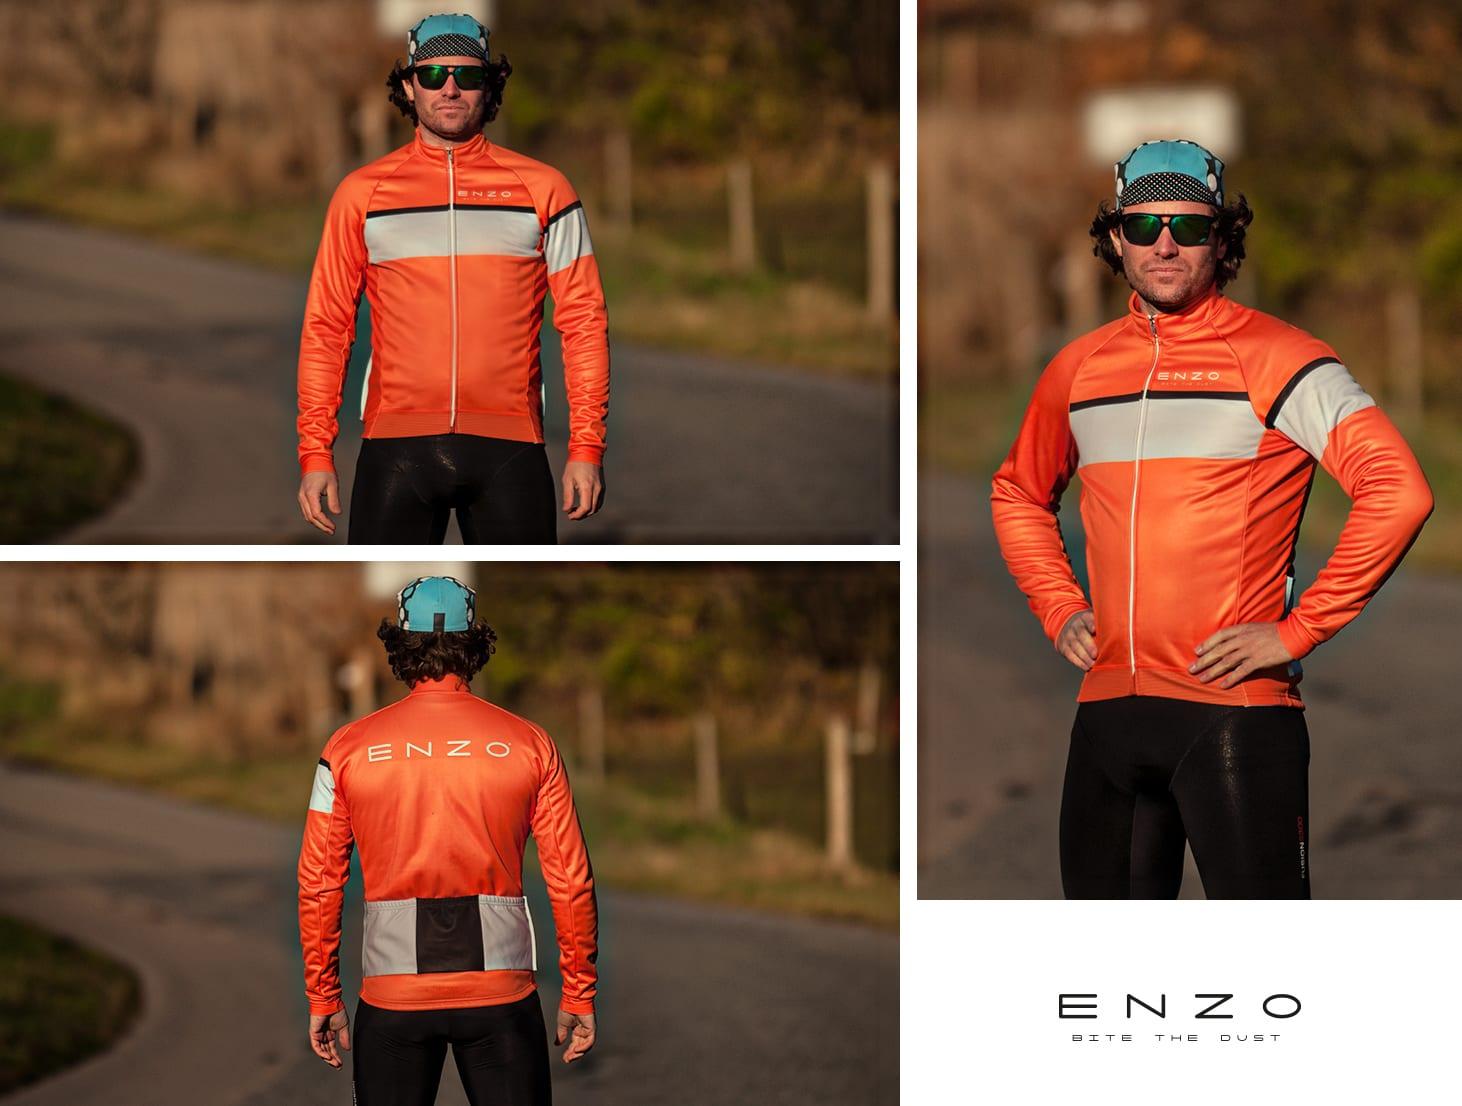 Enzo Jacket Test AltomCykling.dk